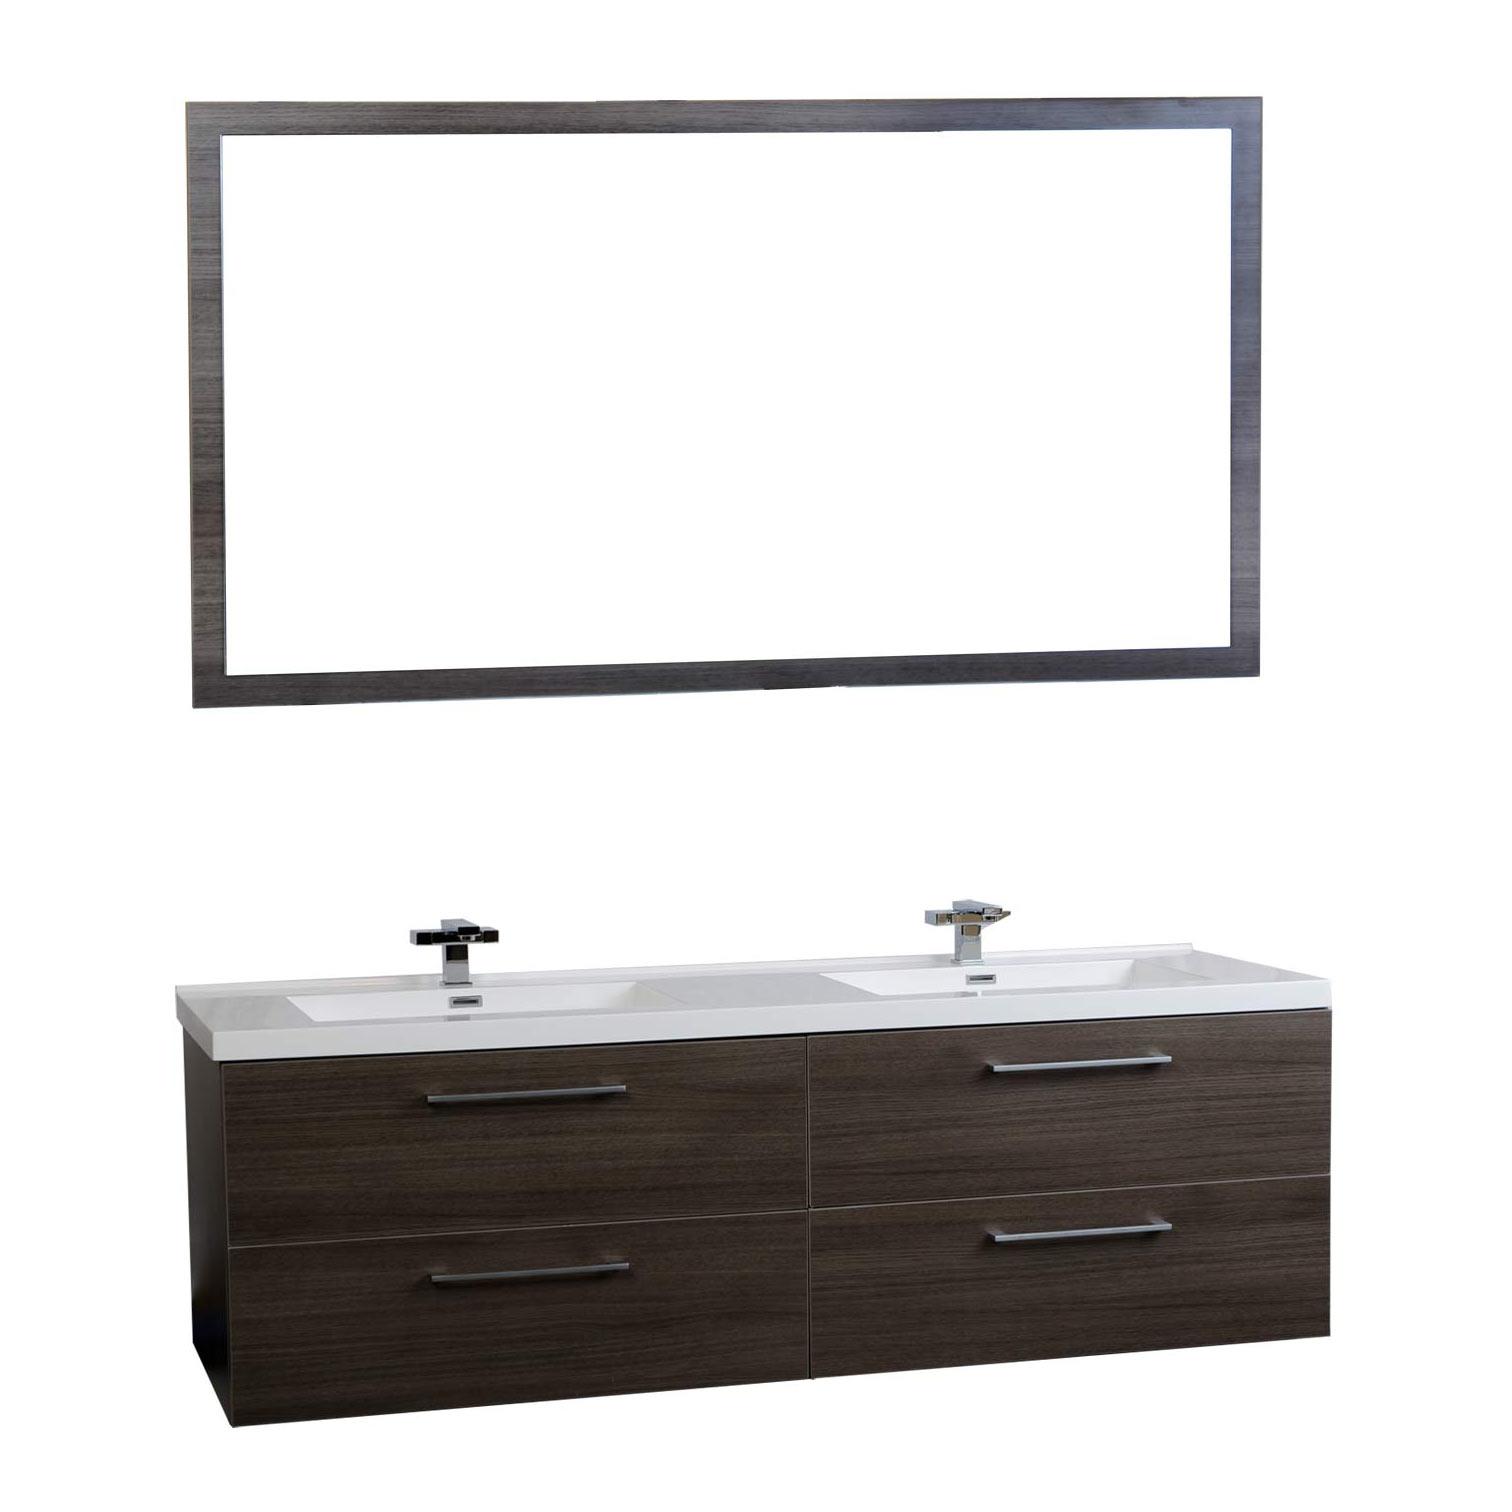 in plus kd dior bathroom bathtubs white wh virtu usa set double vanity c